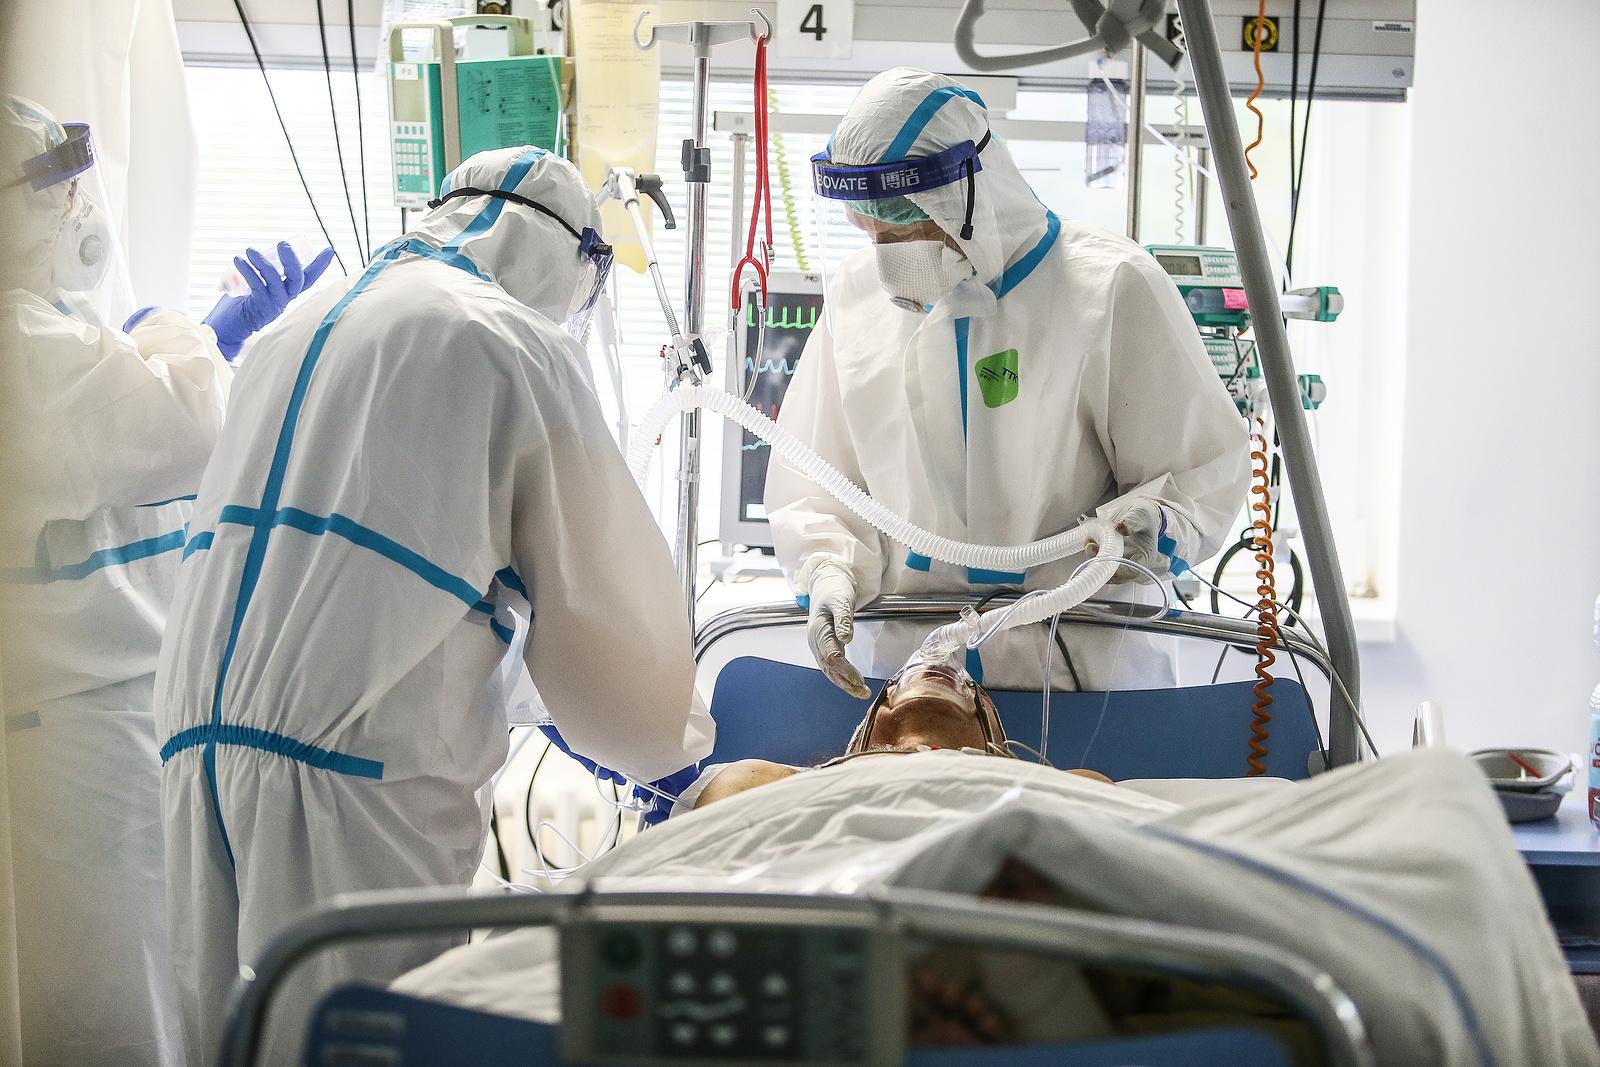 Pomoc nemocnici Nymburk